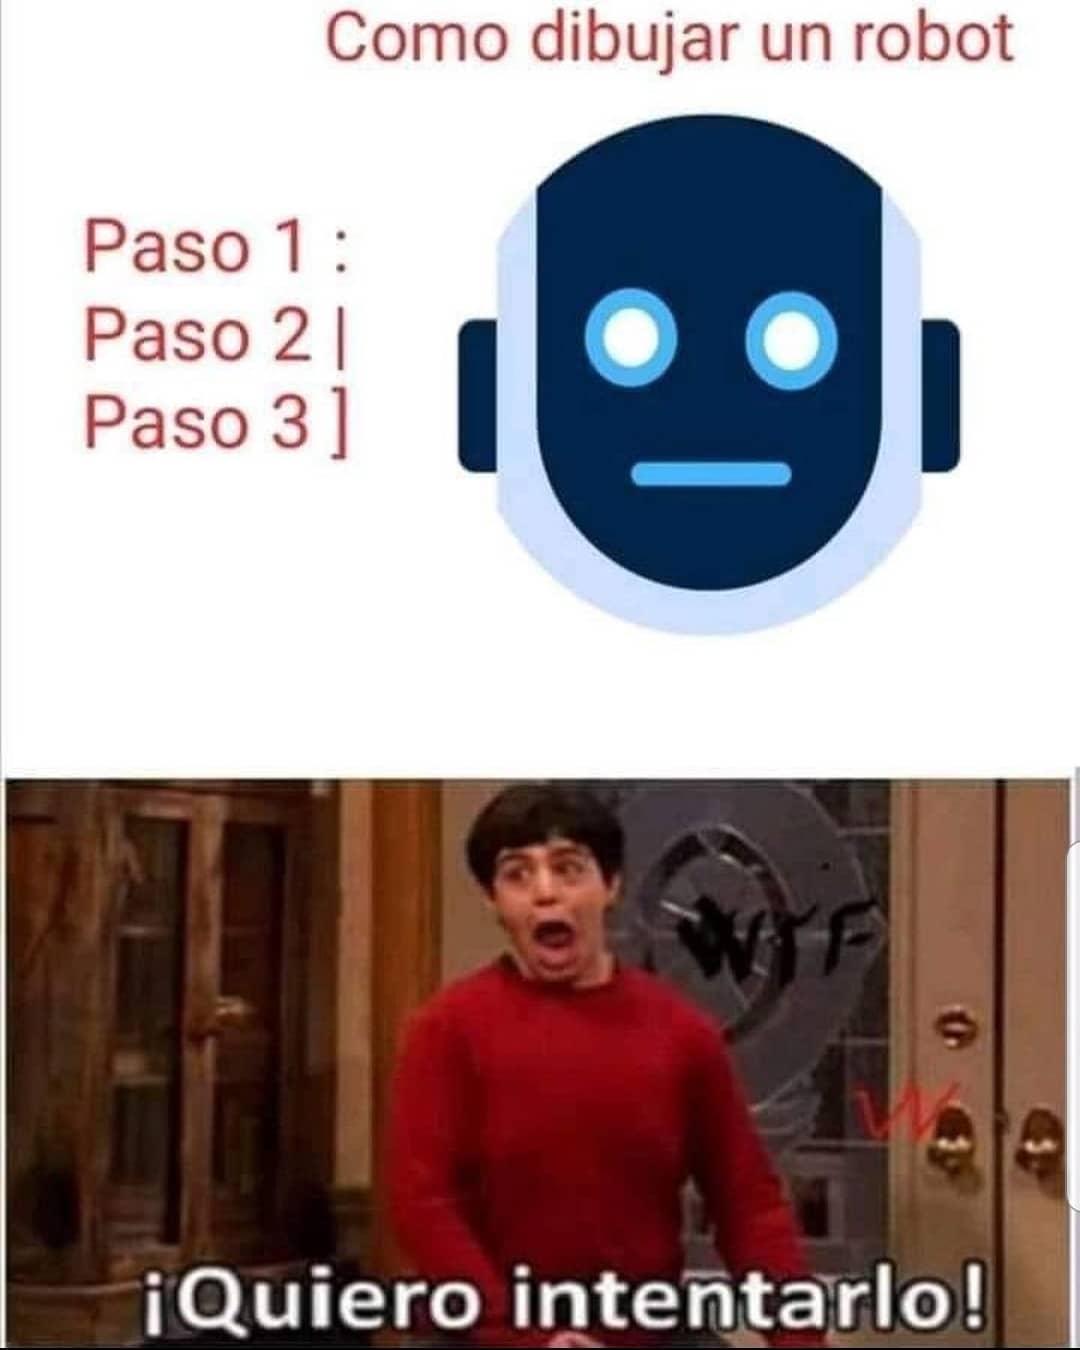 Como dibujar un robot.  Paso 1  Paso 2  Paso 3  ¡Quiero intentarlo!